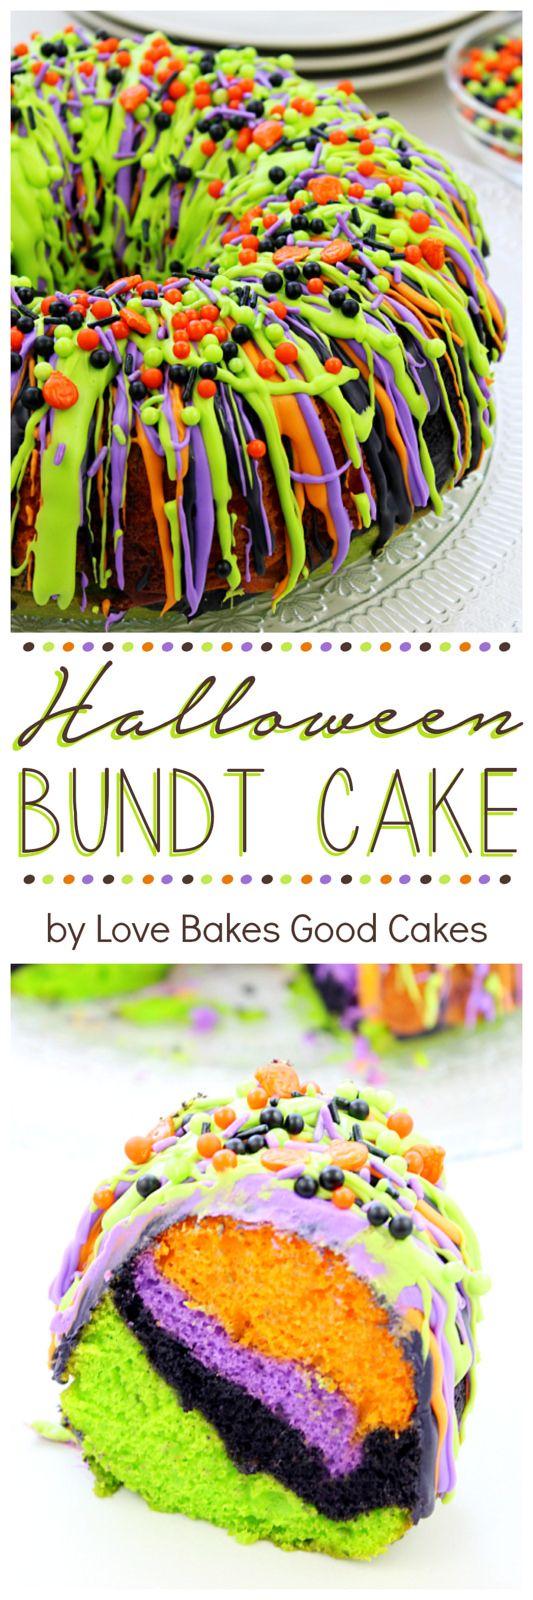 Halloween Bundt Cake | Love Bakes Good Cakes